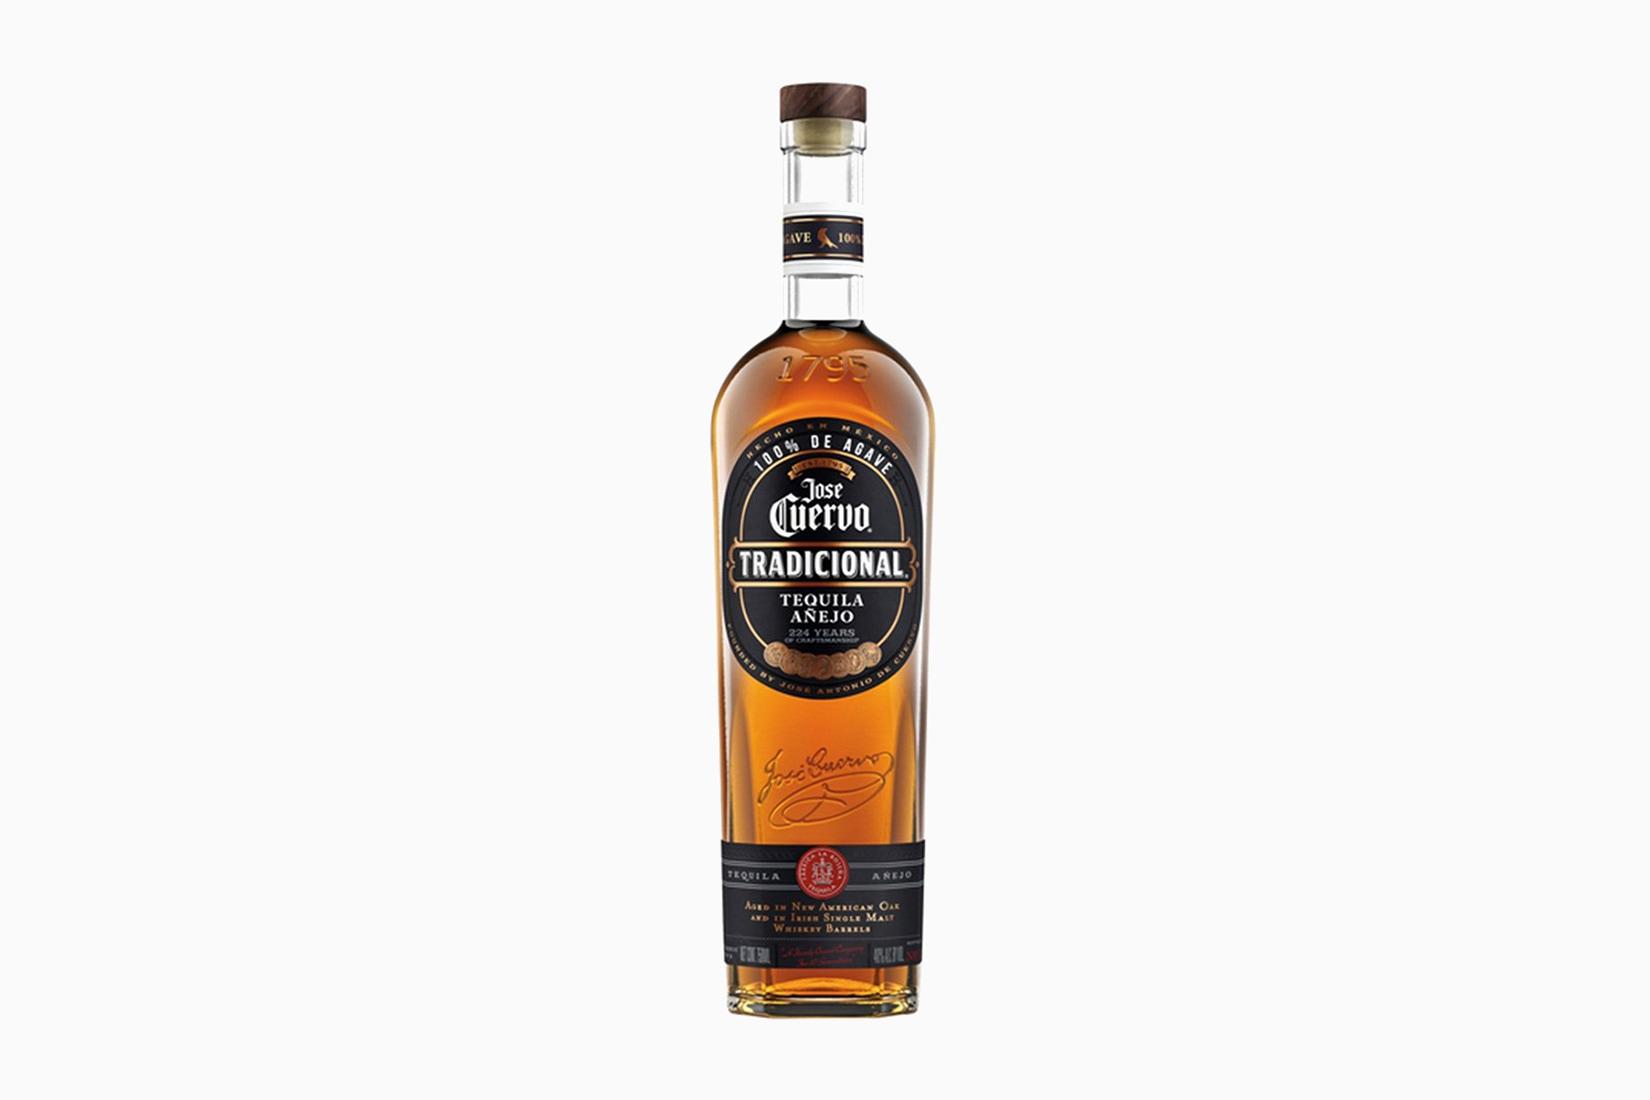 jose cuervo tequila anejo bottle price size - Luxe Digital